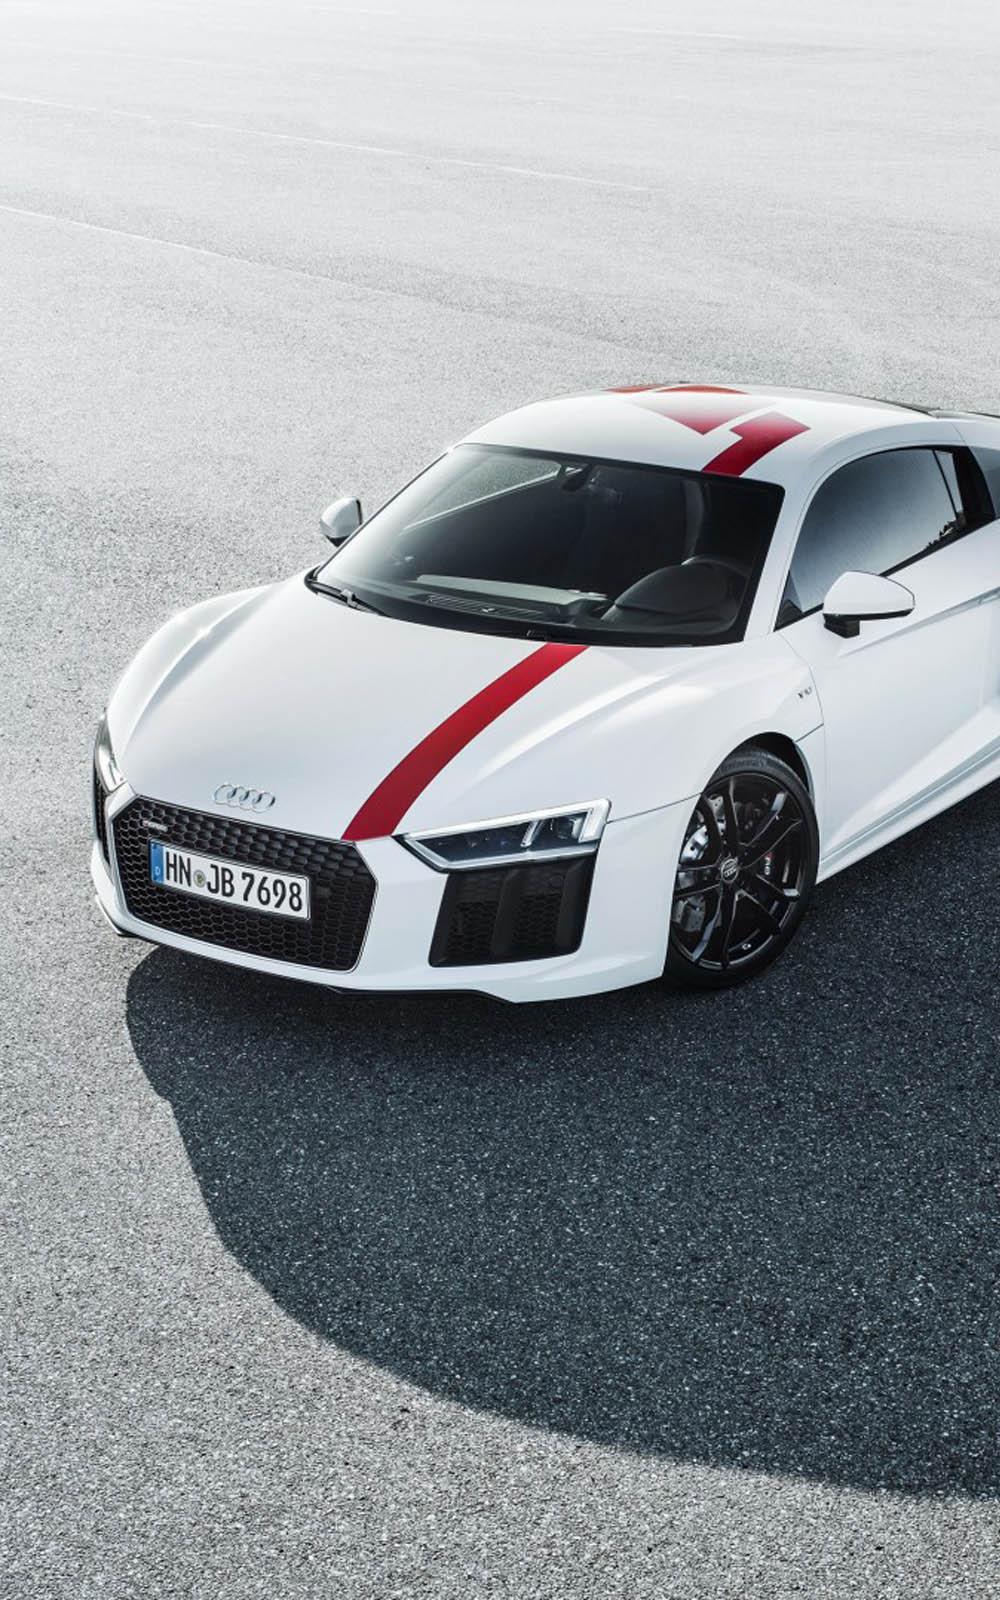 White Audi R8 V10 Rws 2018 4k Ultra Hd Mobile Wallpaper